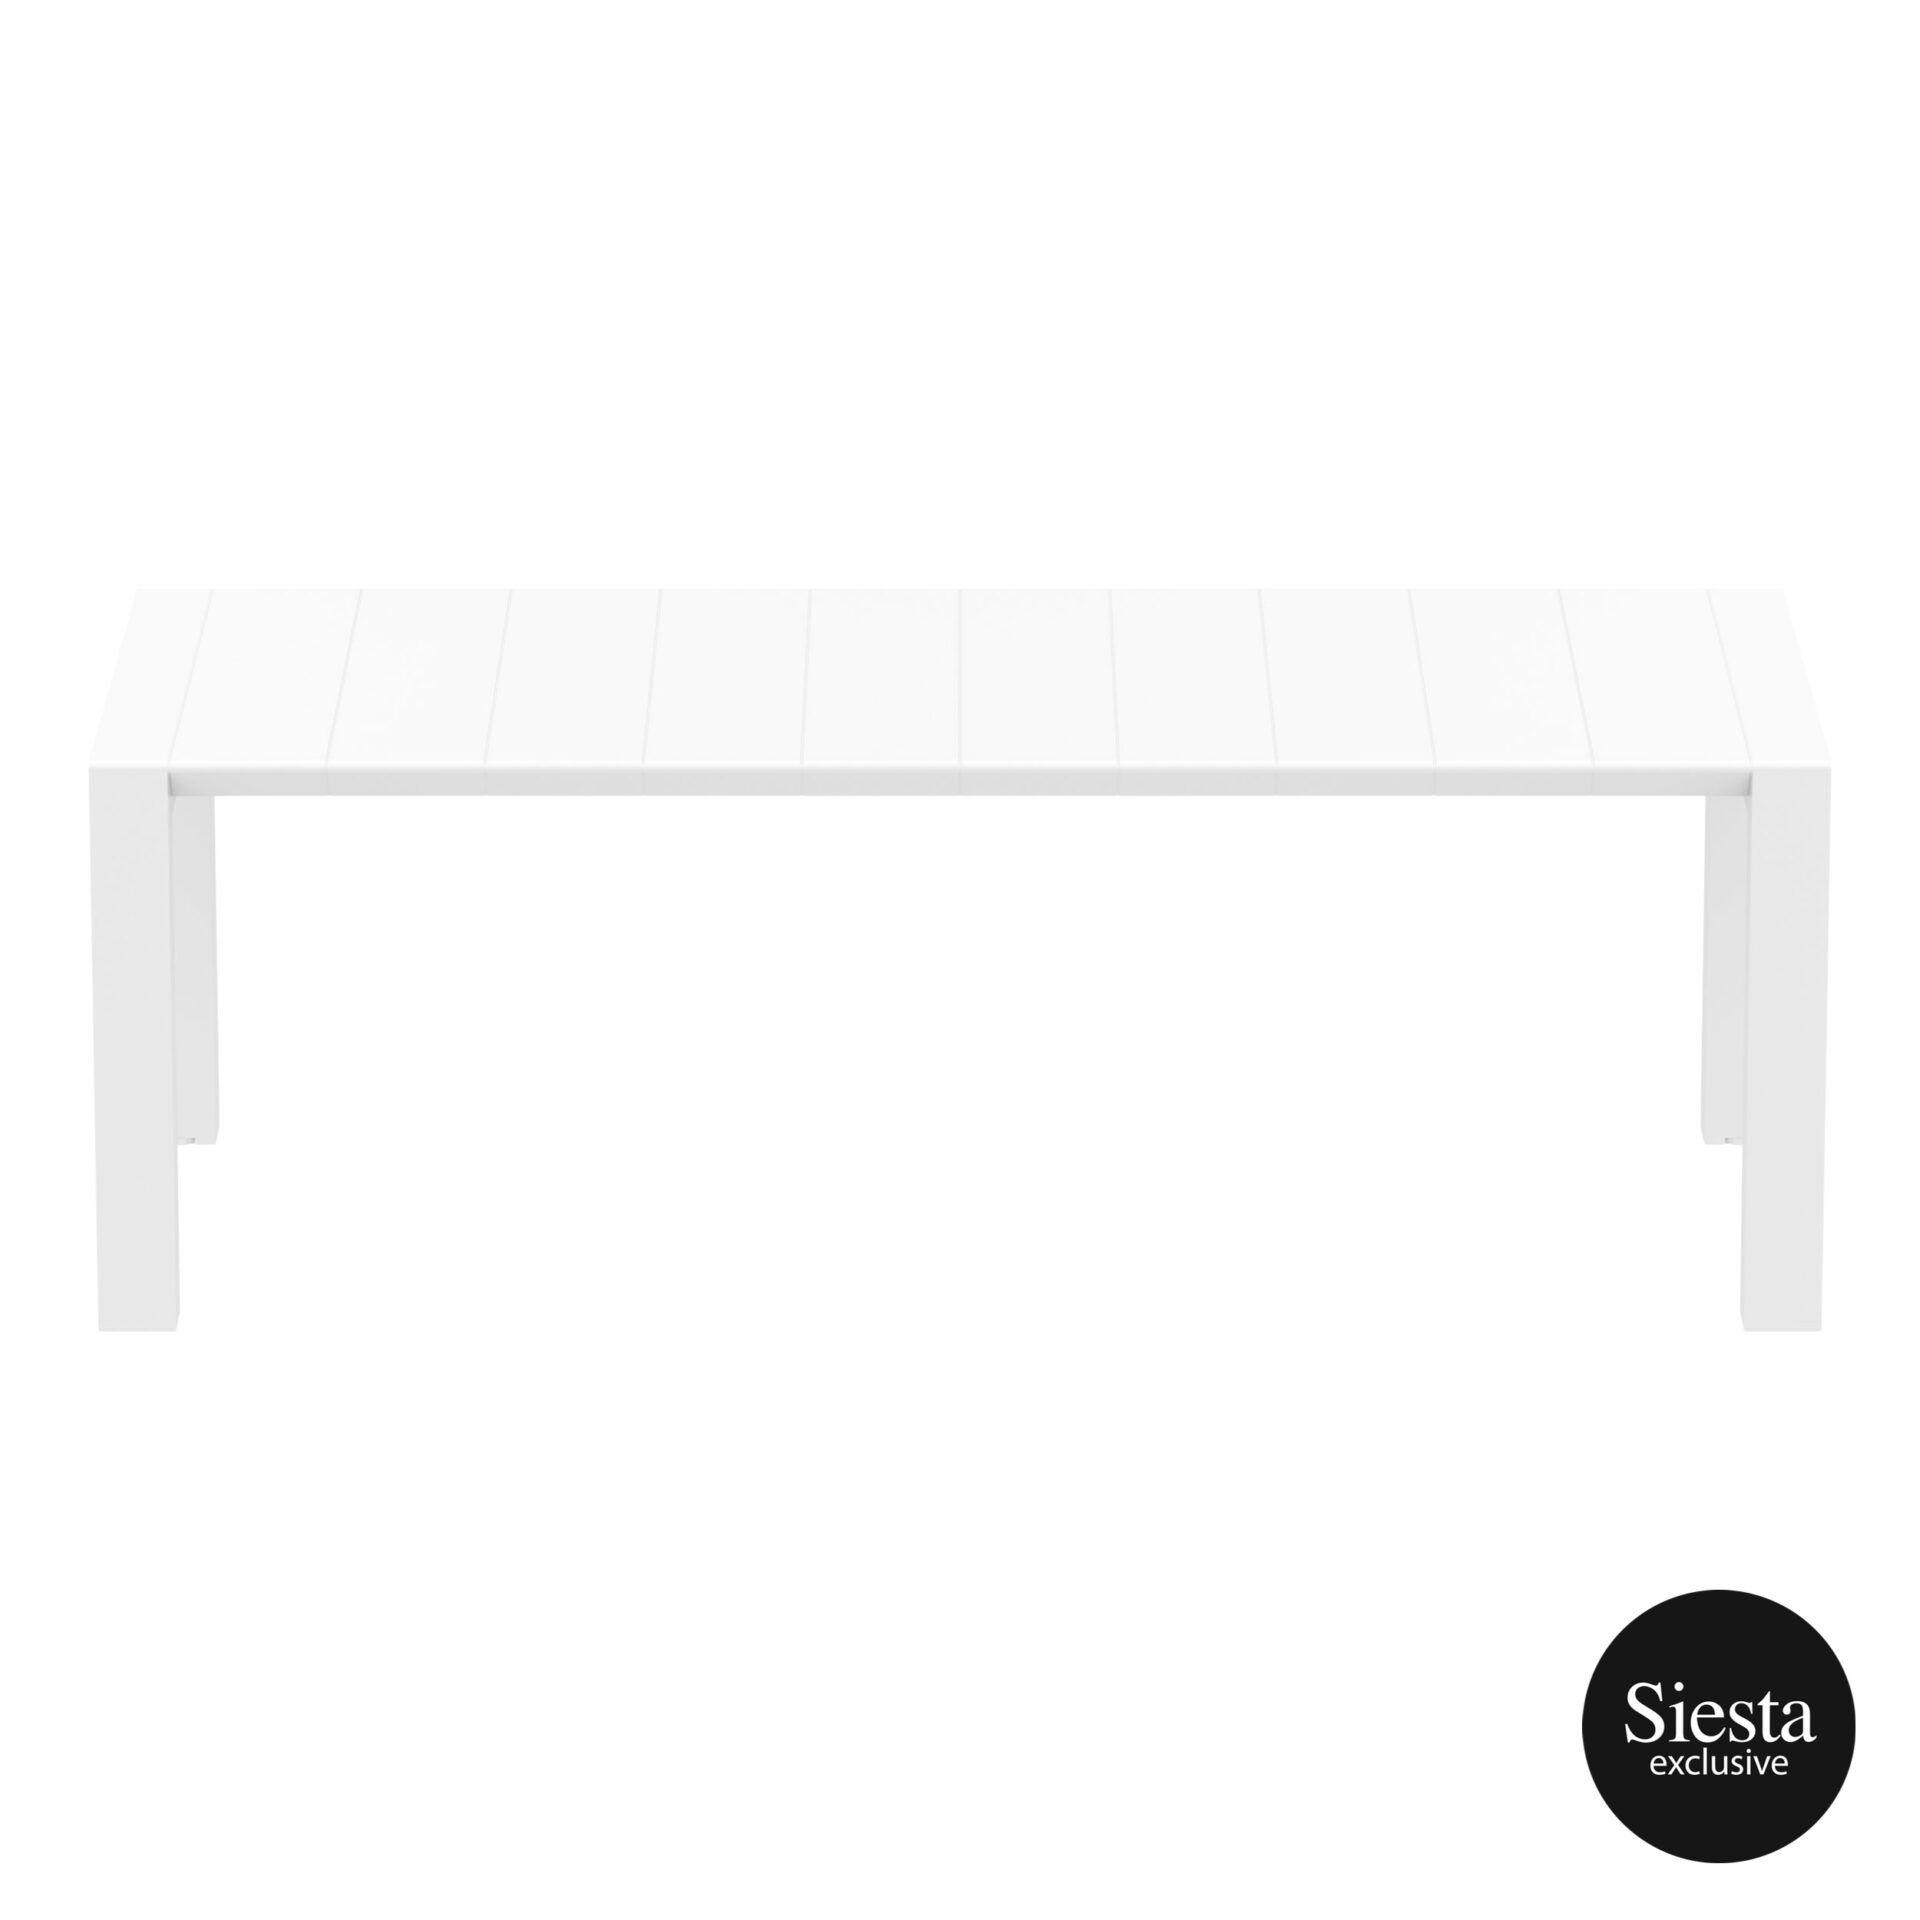 023 vegas medium table 220 white long edge